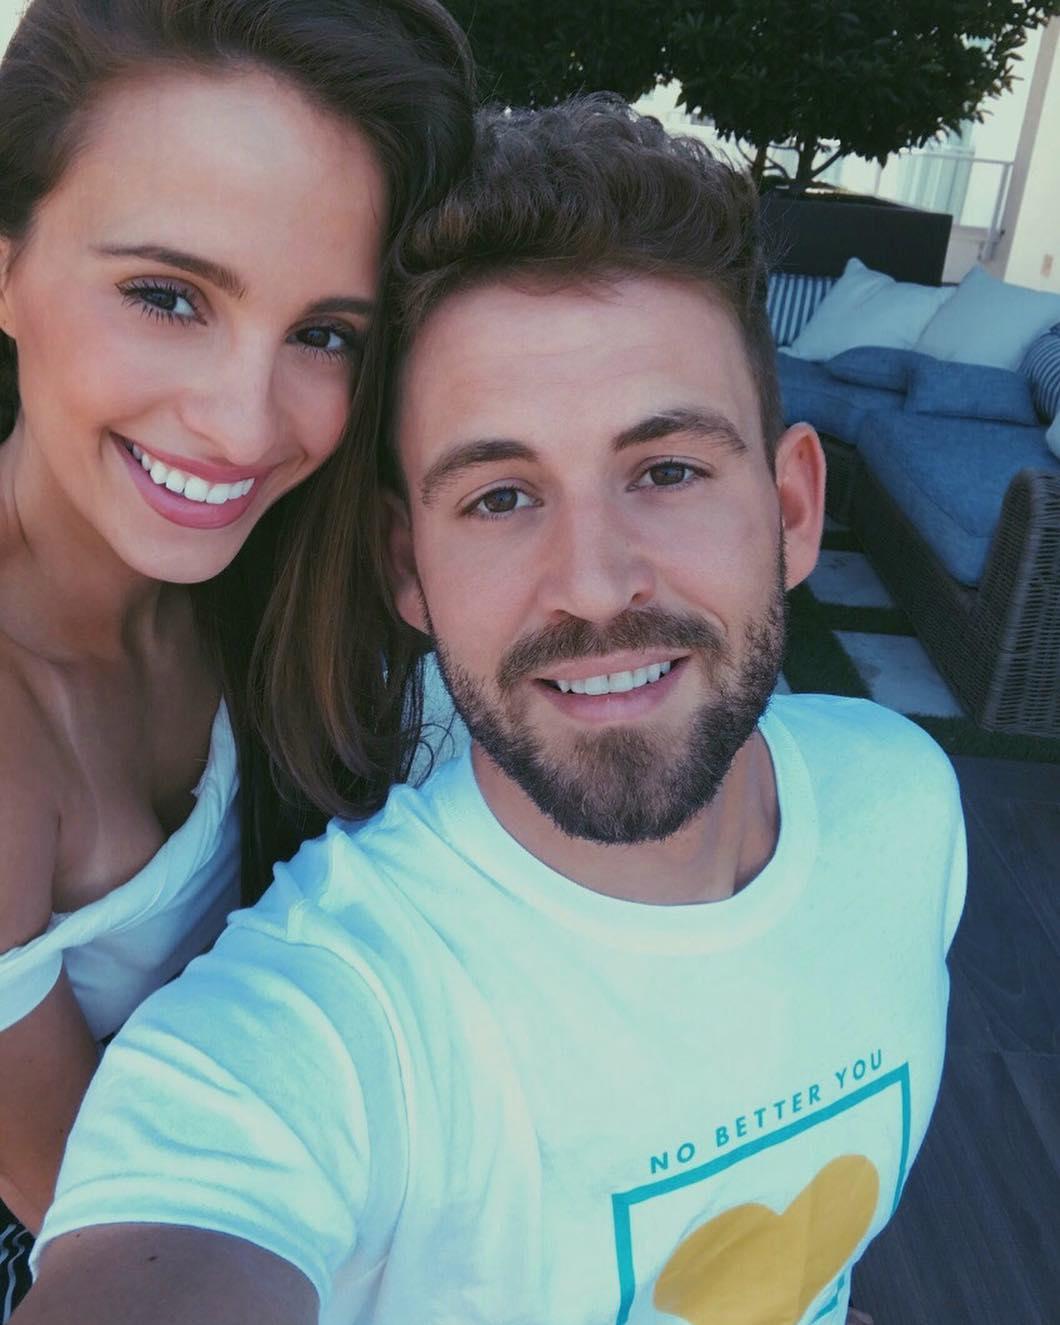 Nick Viall and Vanessa Grimaldi